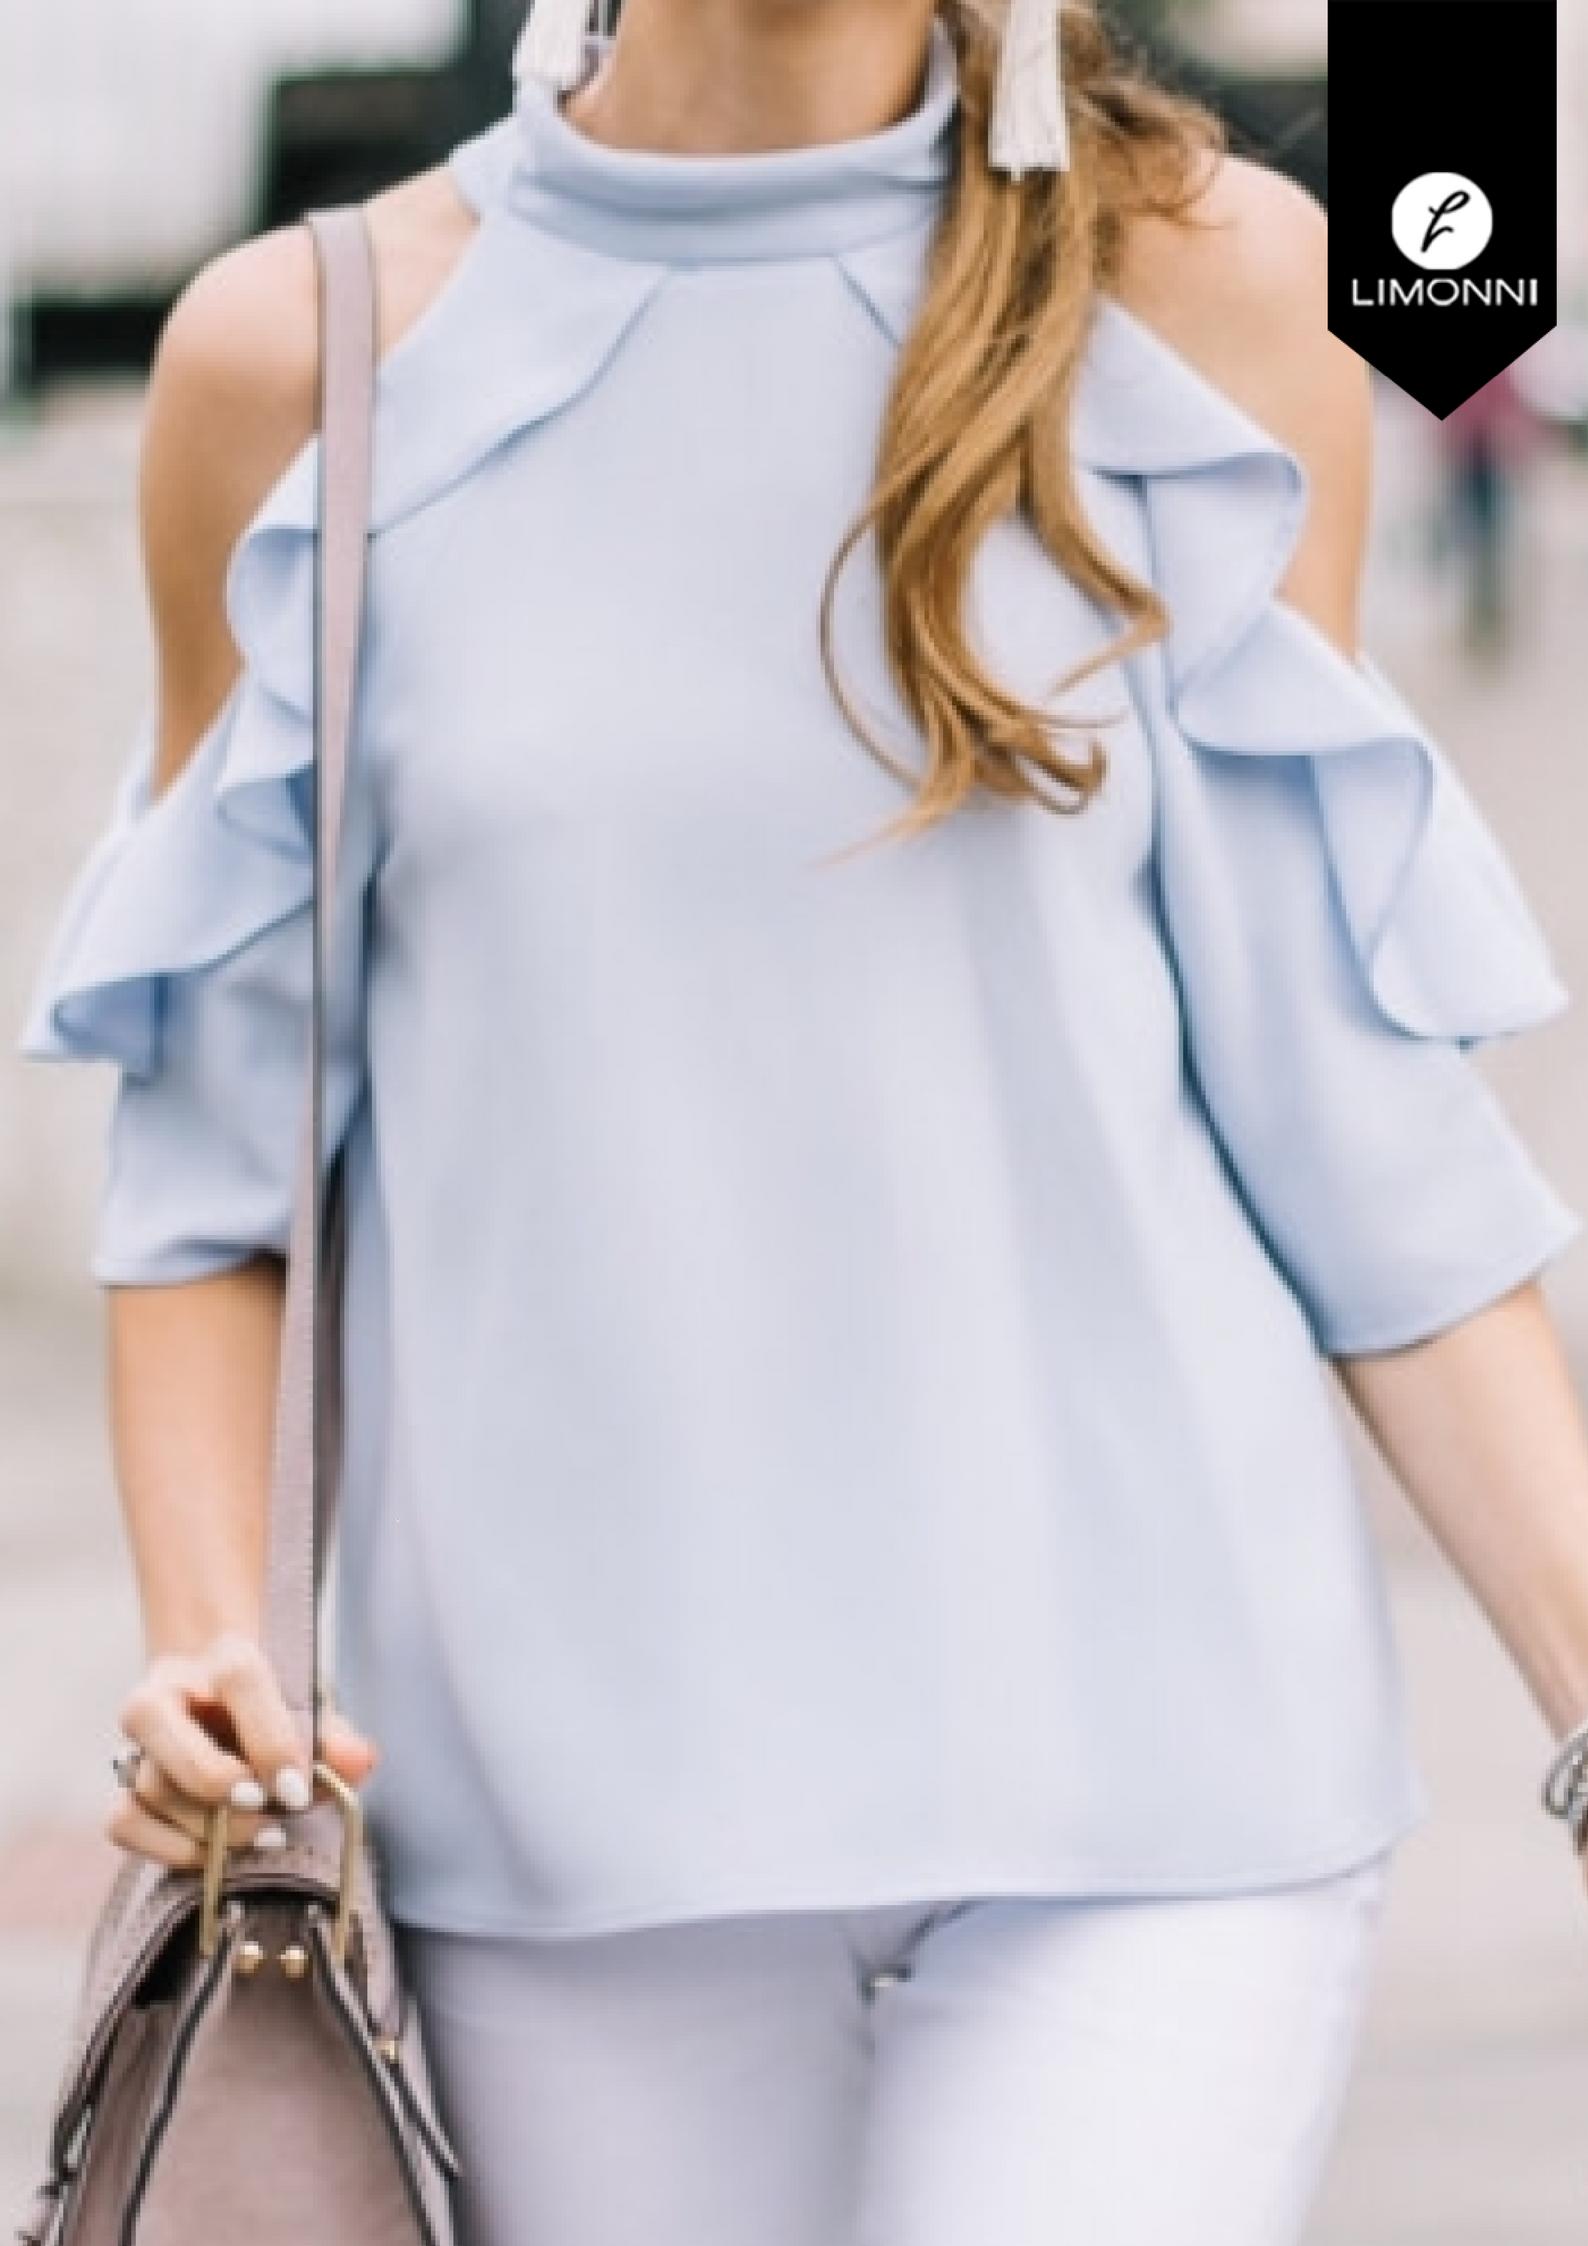 Blusas para mujer Limonni Bennett LI1338 Casuales